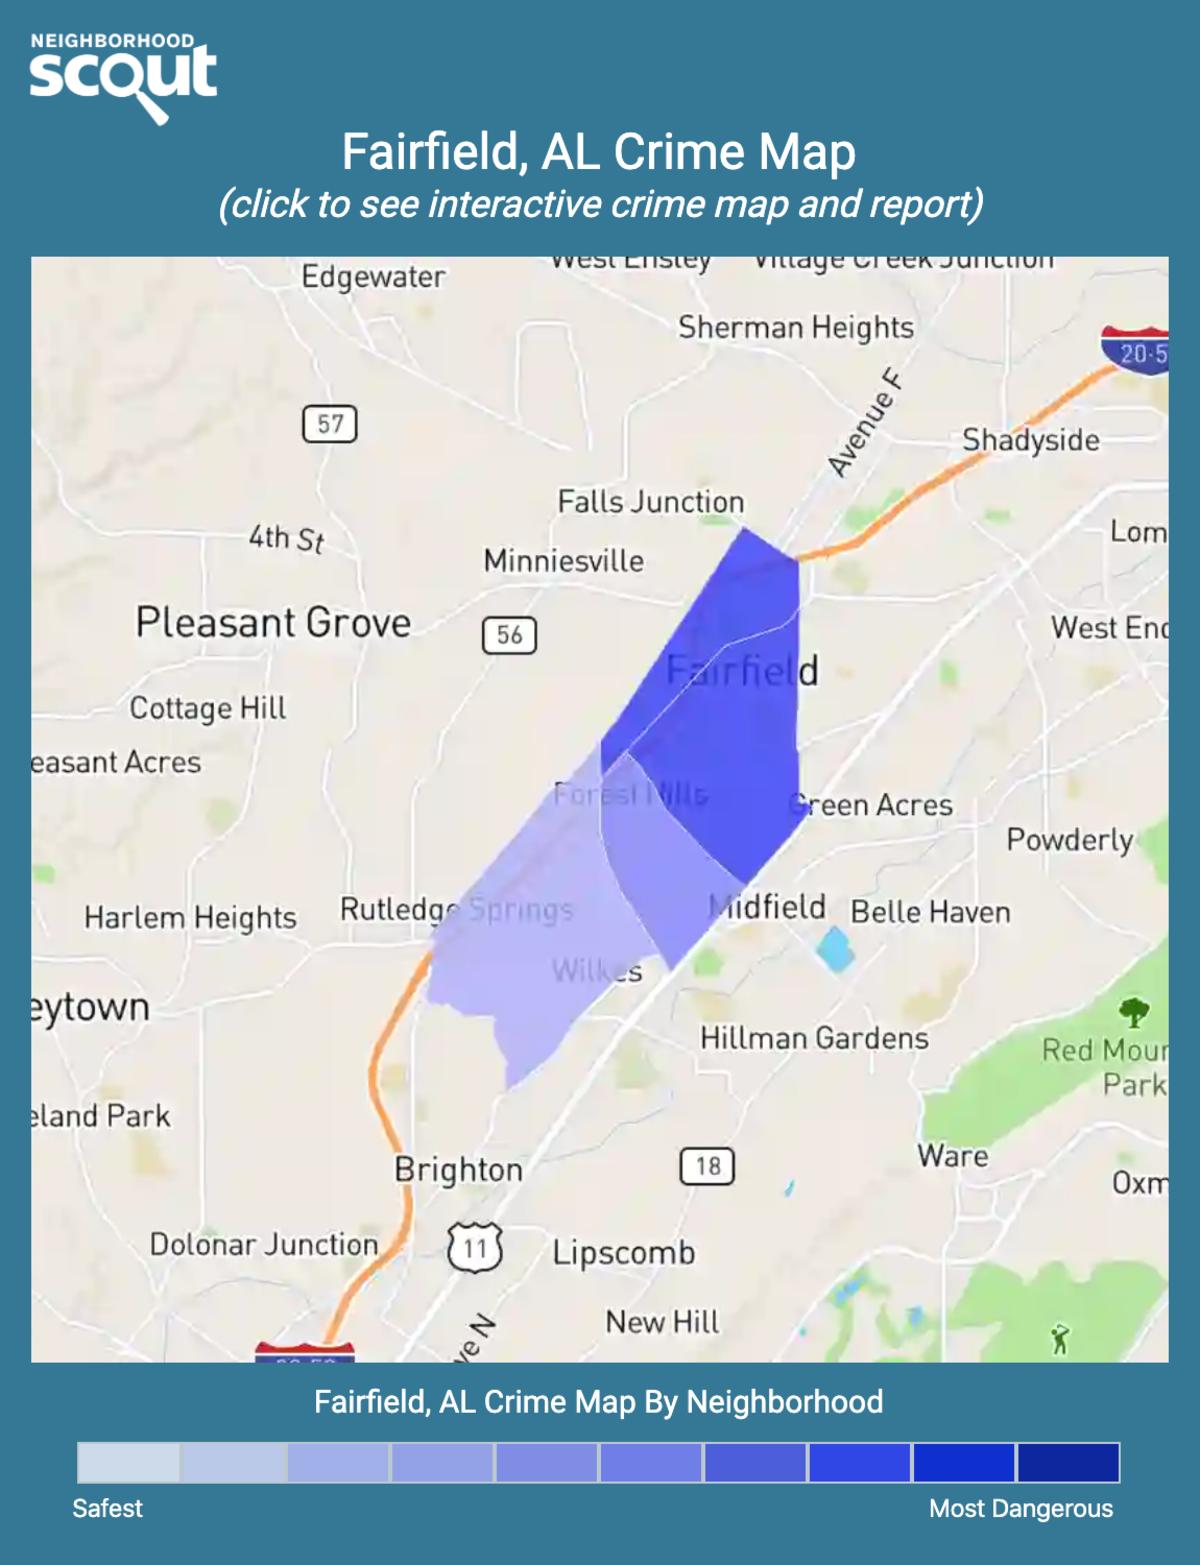 Fairfield, Alabama crime map